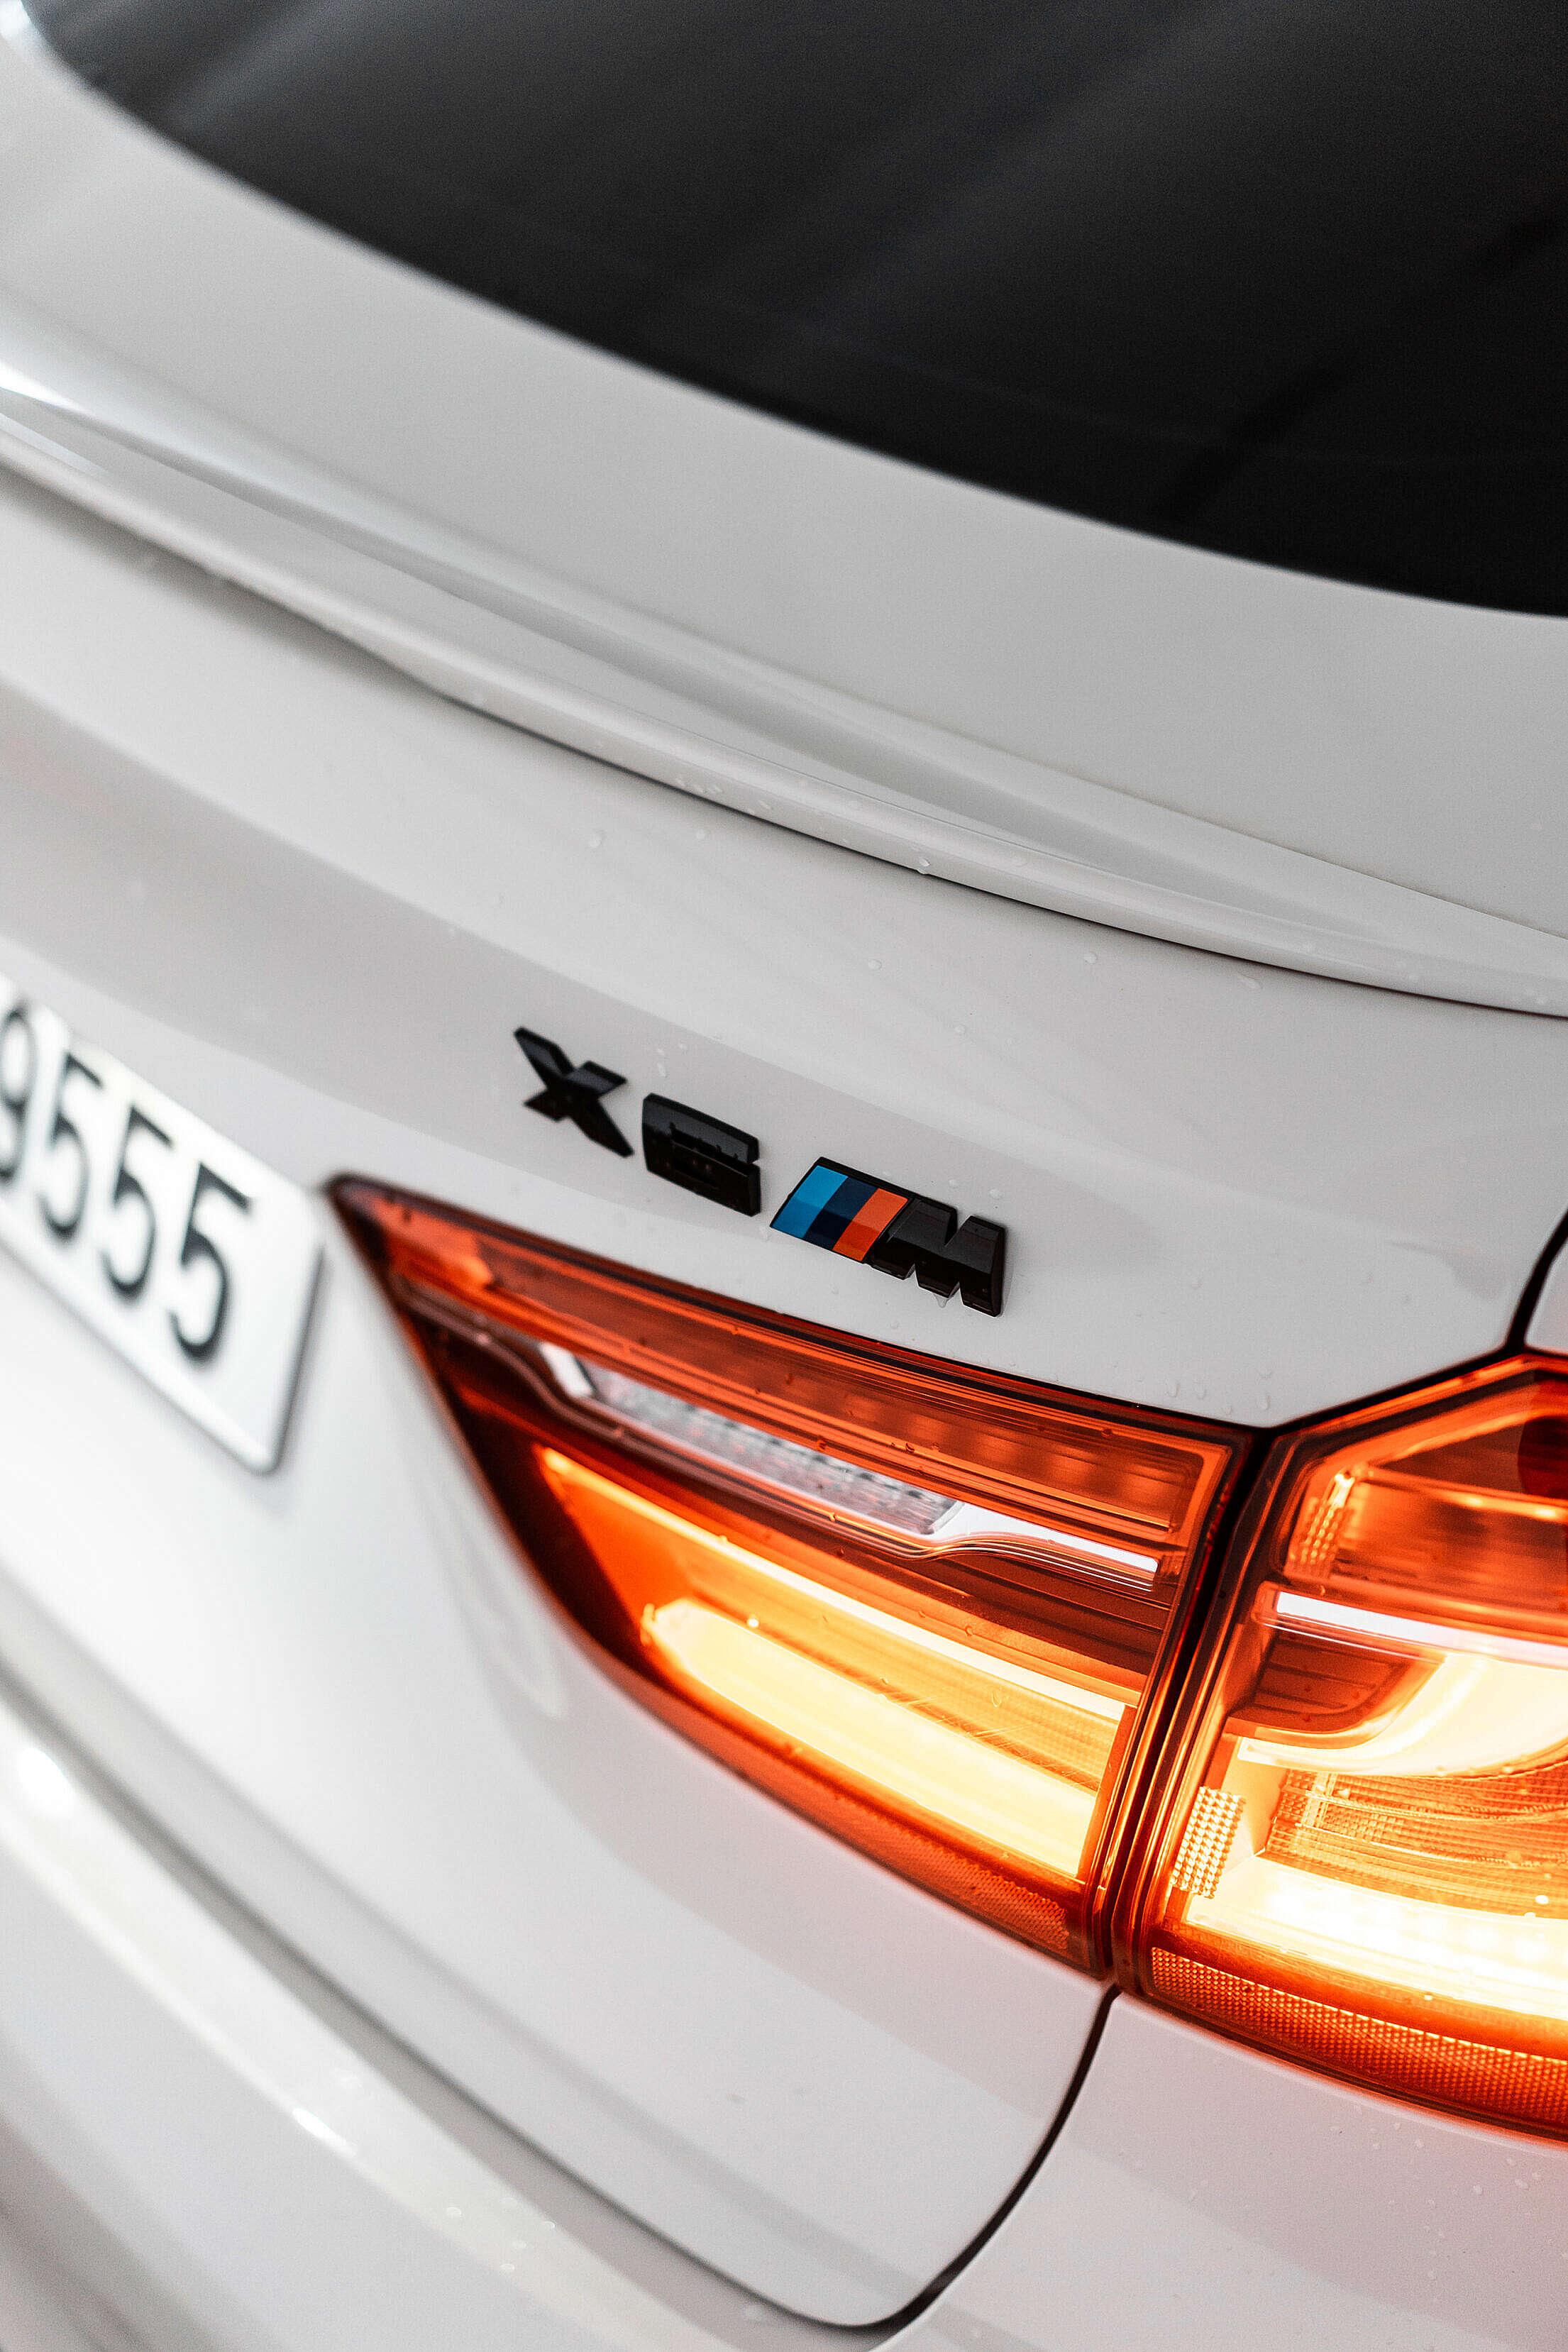 Black BMW X6M Rear Badge Logo Free Stock Photo